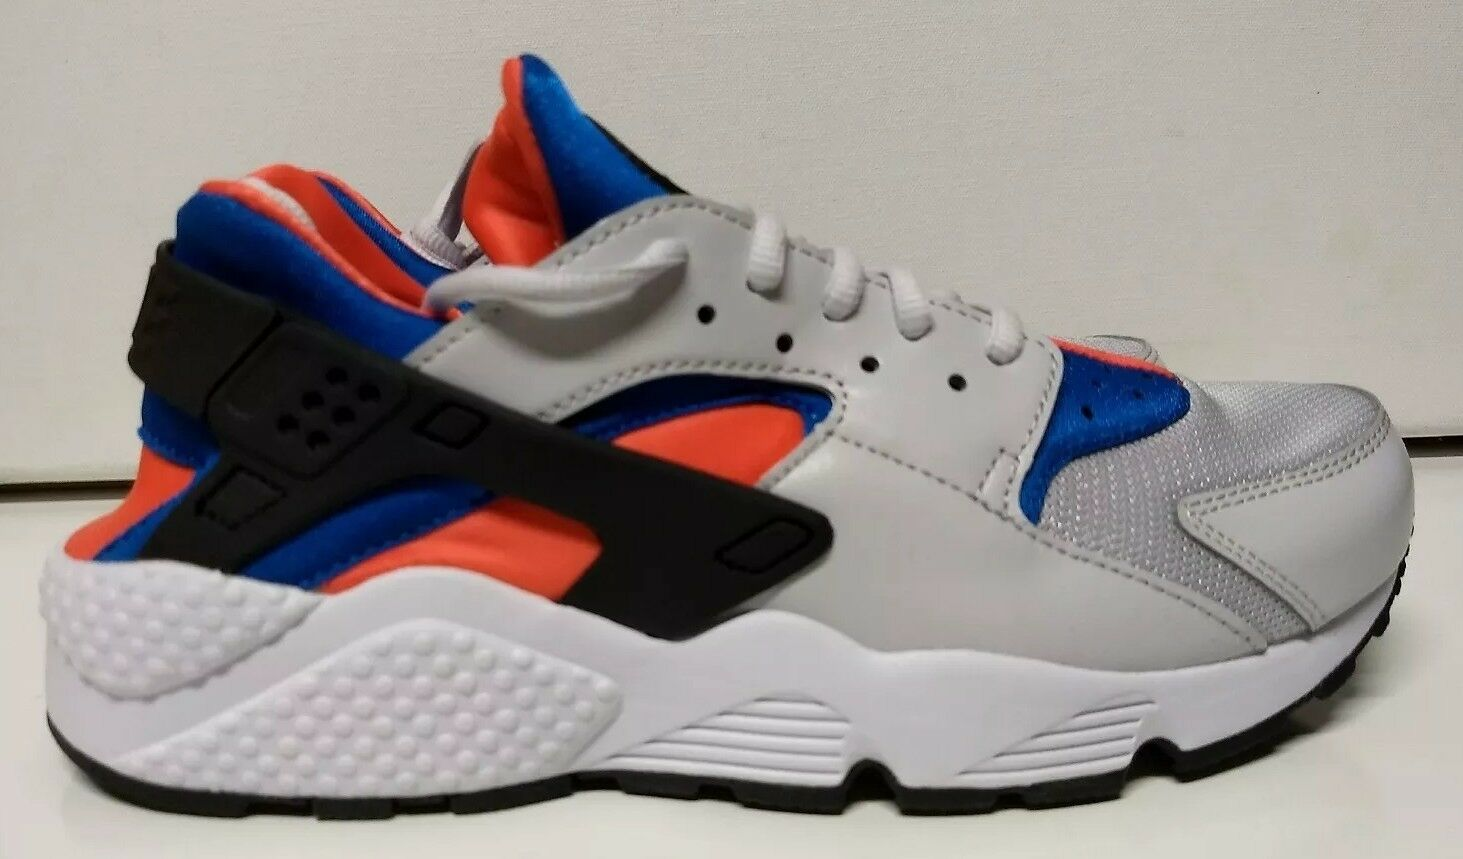 Nike WMNS Womens Air Huarache Run Size 9 Vast Grey White Running Shoe 634835-031